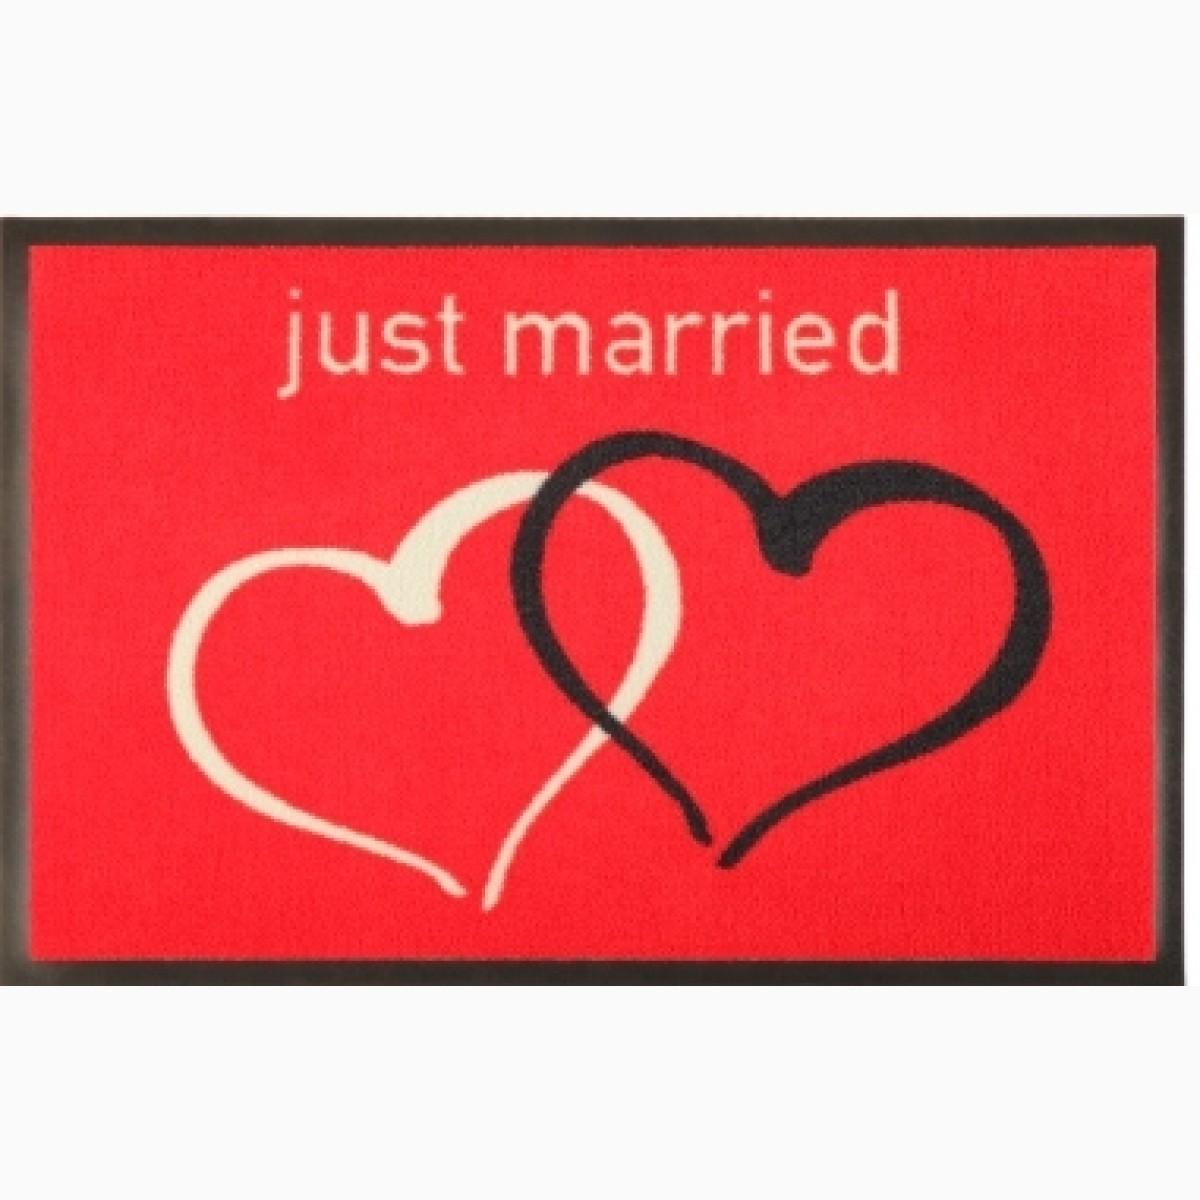 Fußmatte Herzen just married Situation